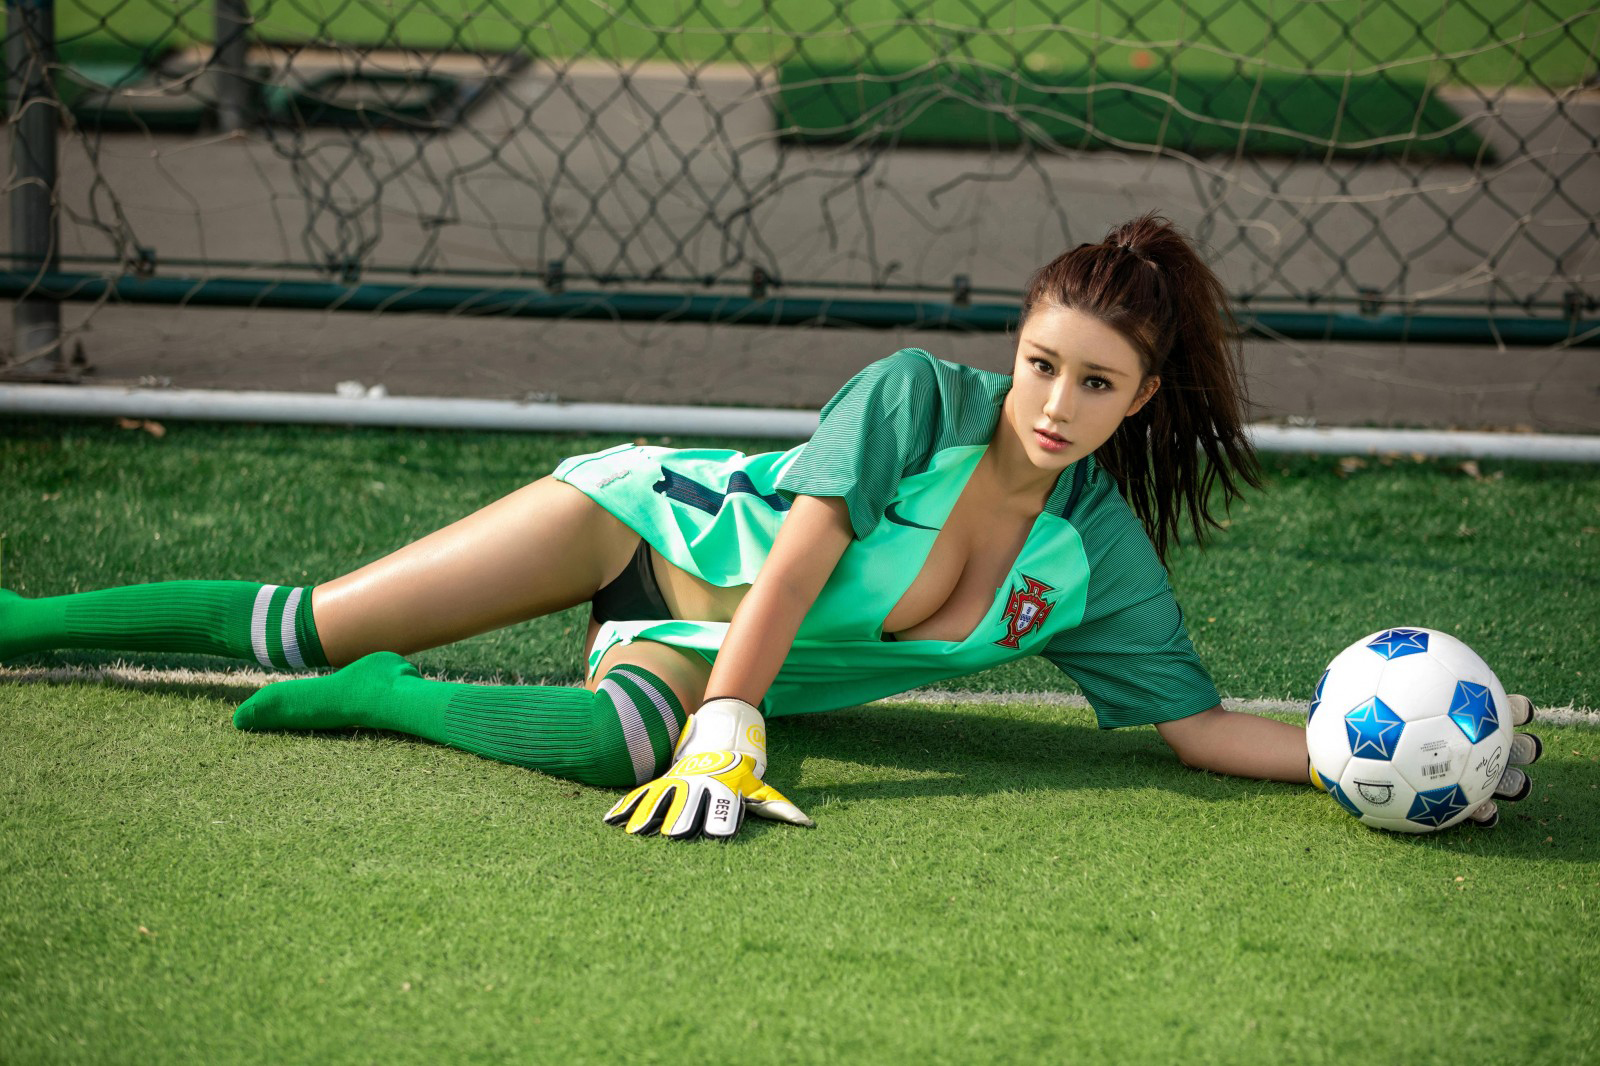 Beberapa Hal yang Mesti Diperhatikan Bettors Dalam Memainkan Taruhan Bola Online